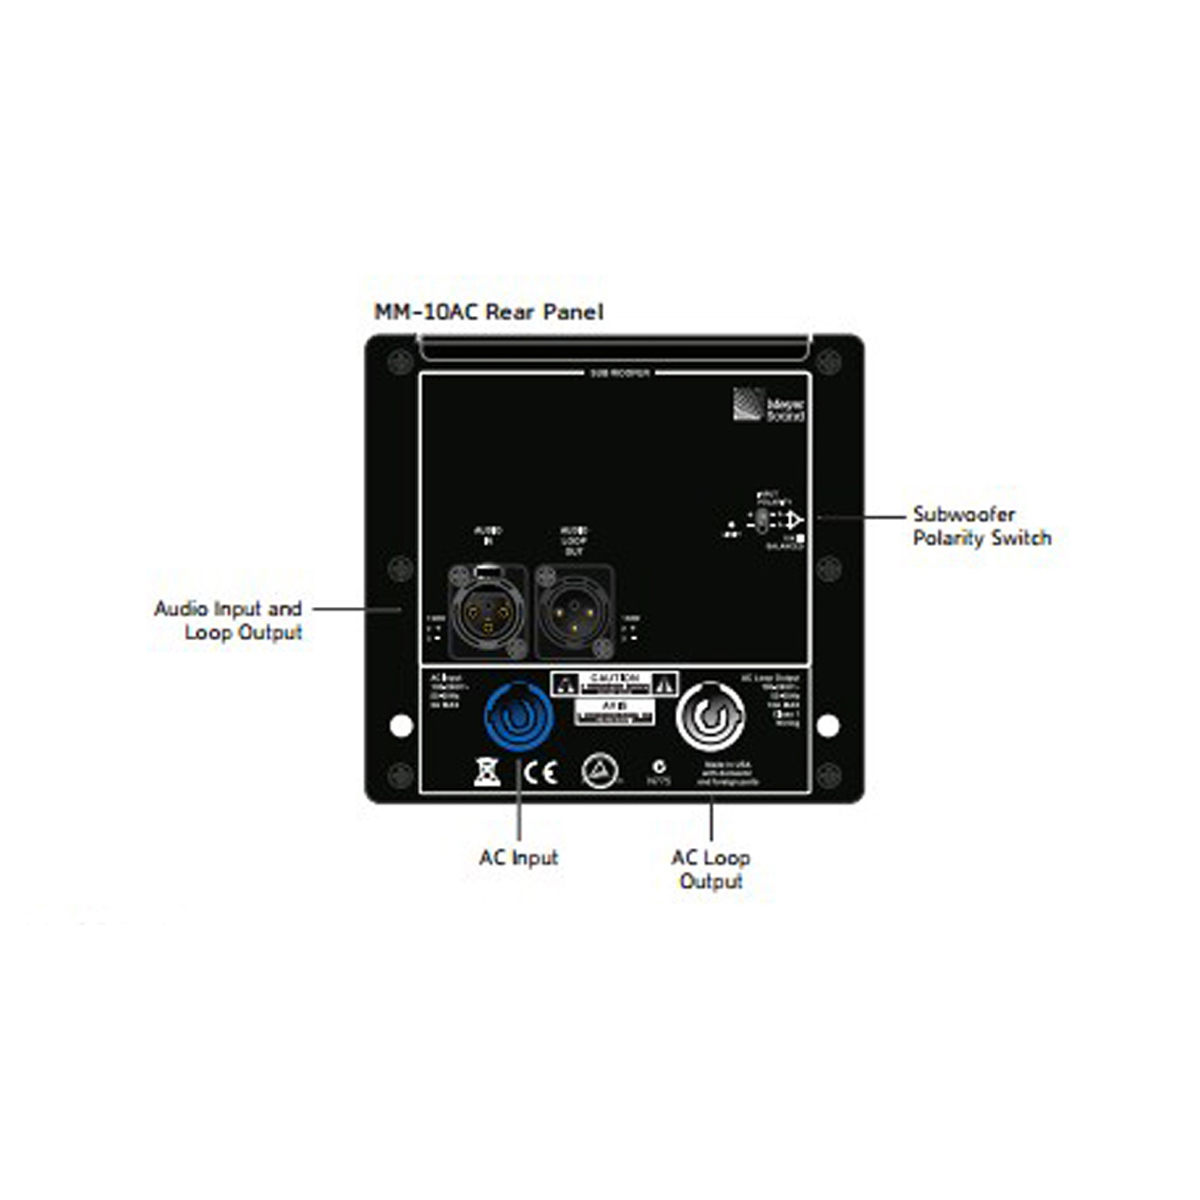 75564 wireless receiver for SR210 NEW OEM Part Snowex D6061